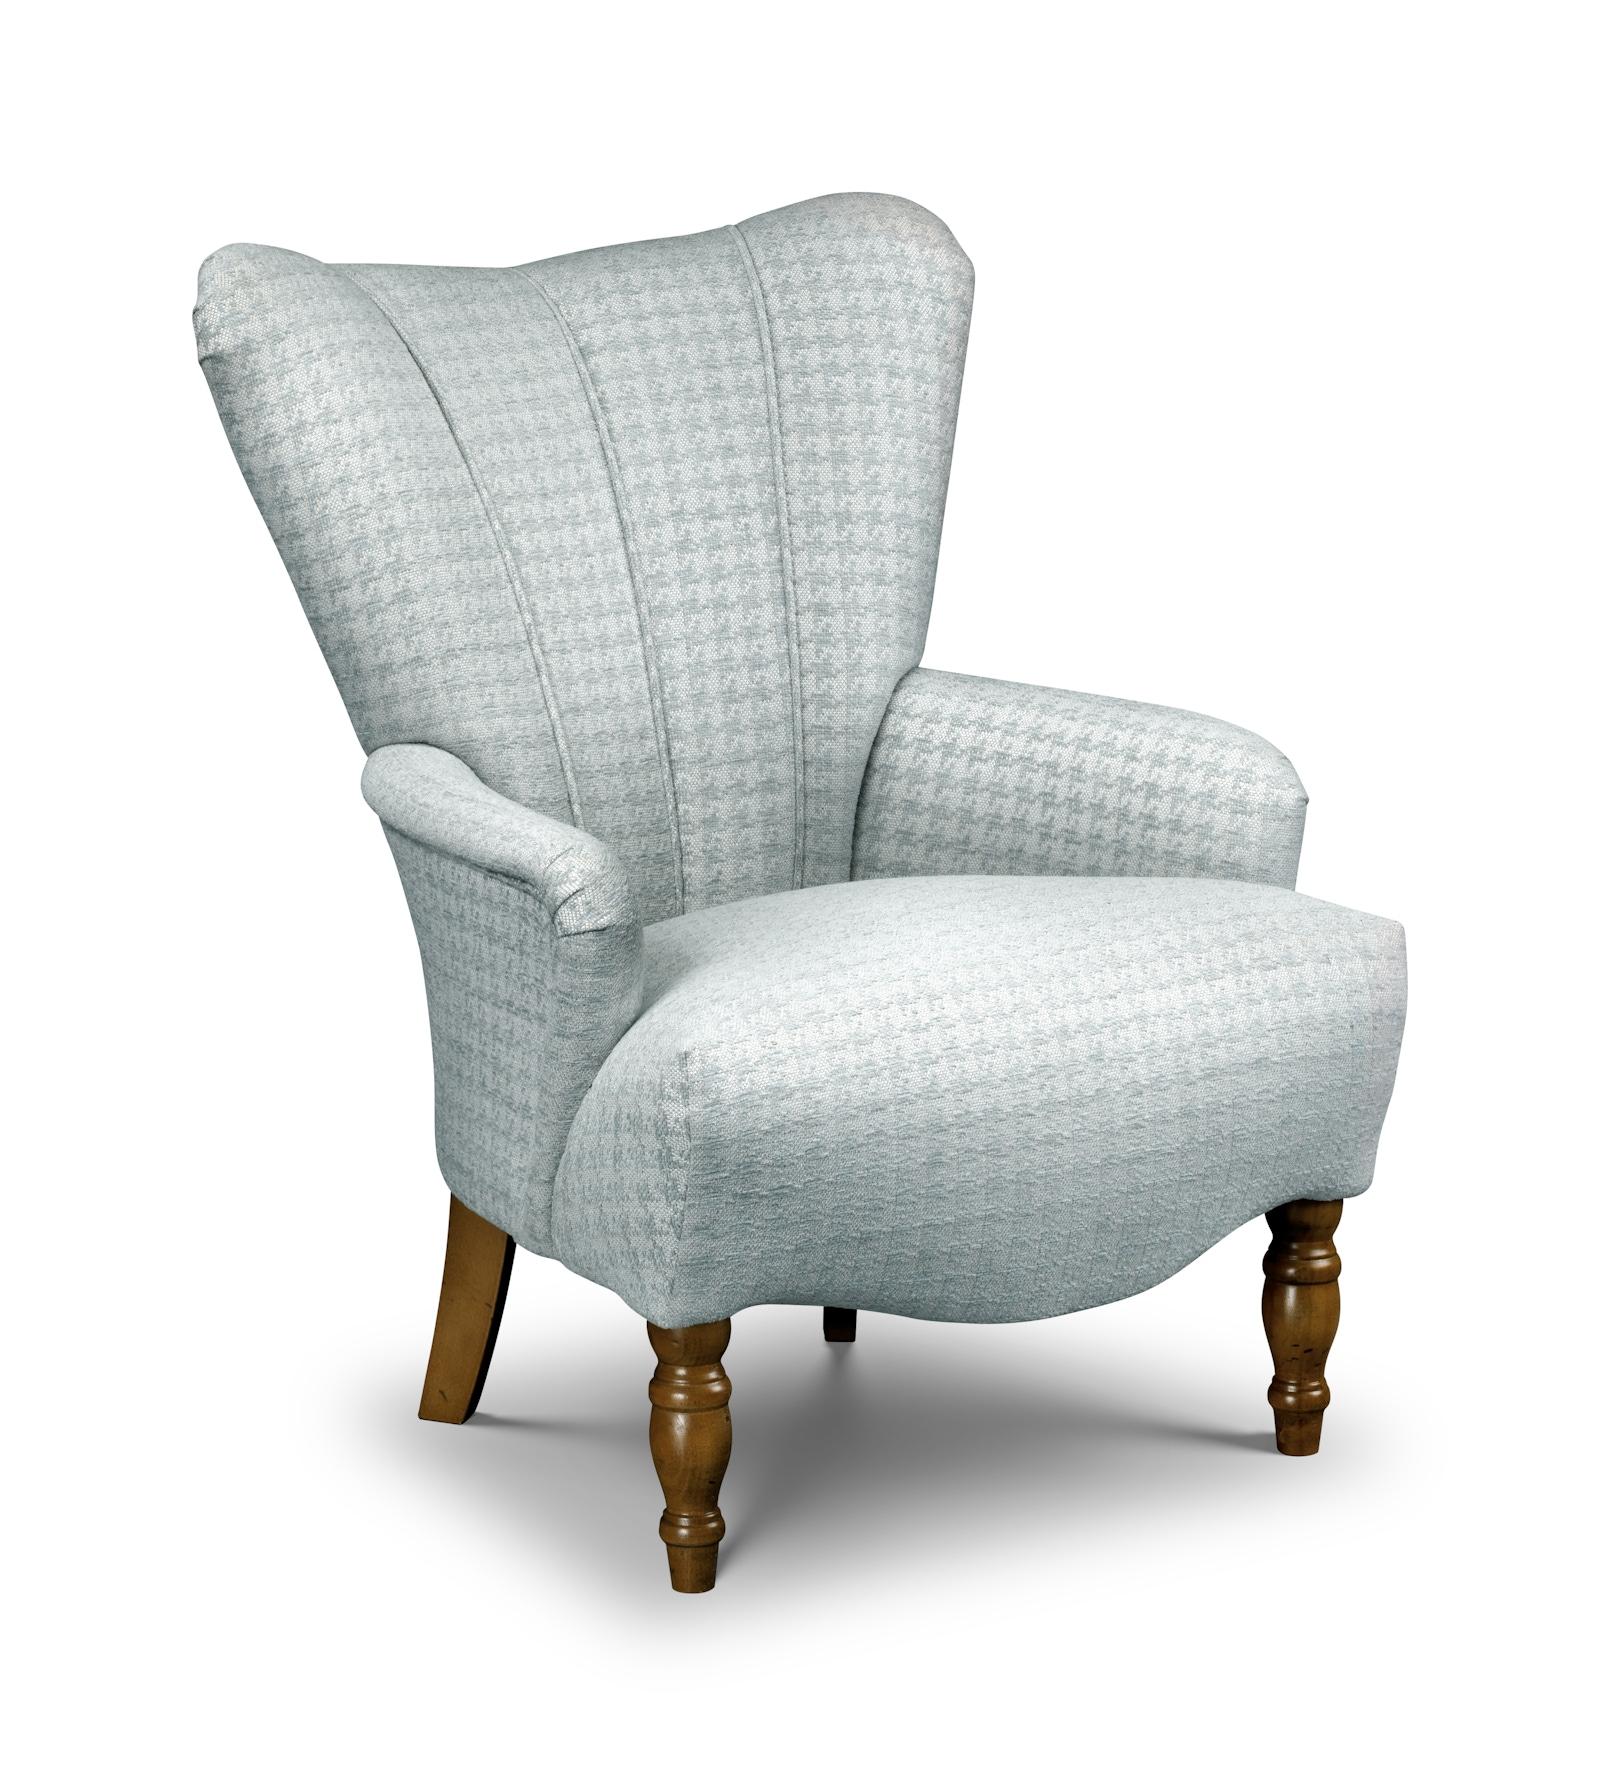 MEL dogtooth chair